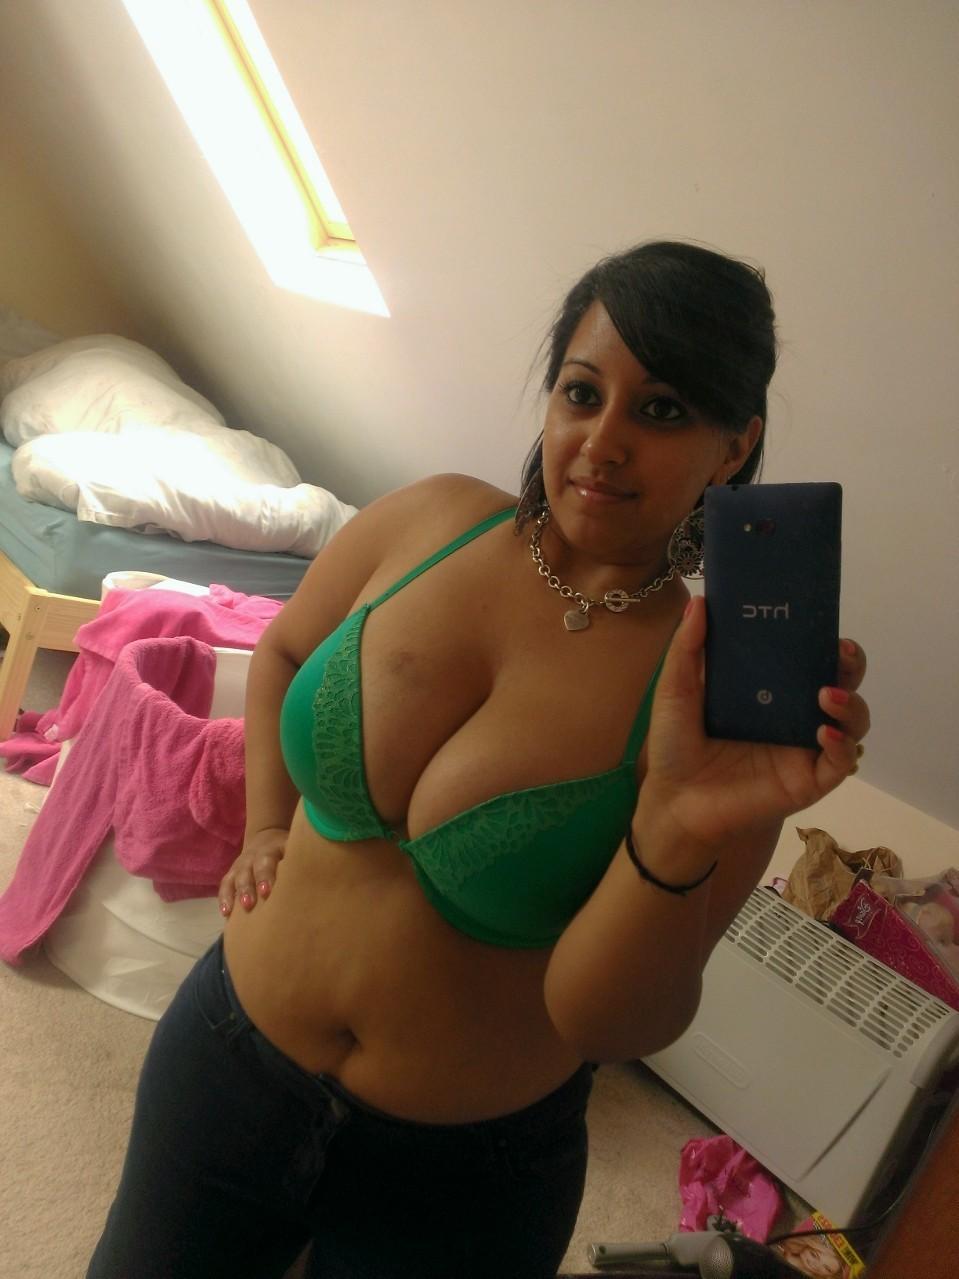 Bhabhi Bra Panty Pics  Bangladeshi Sexy Boobs Girls -2061